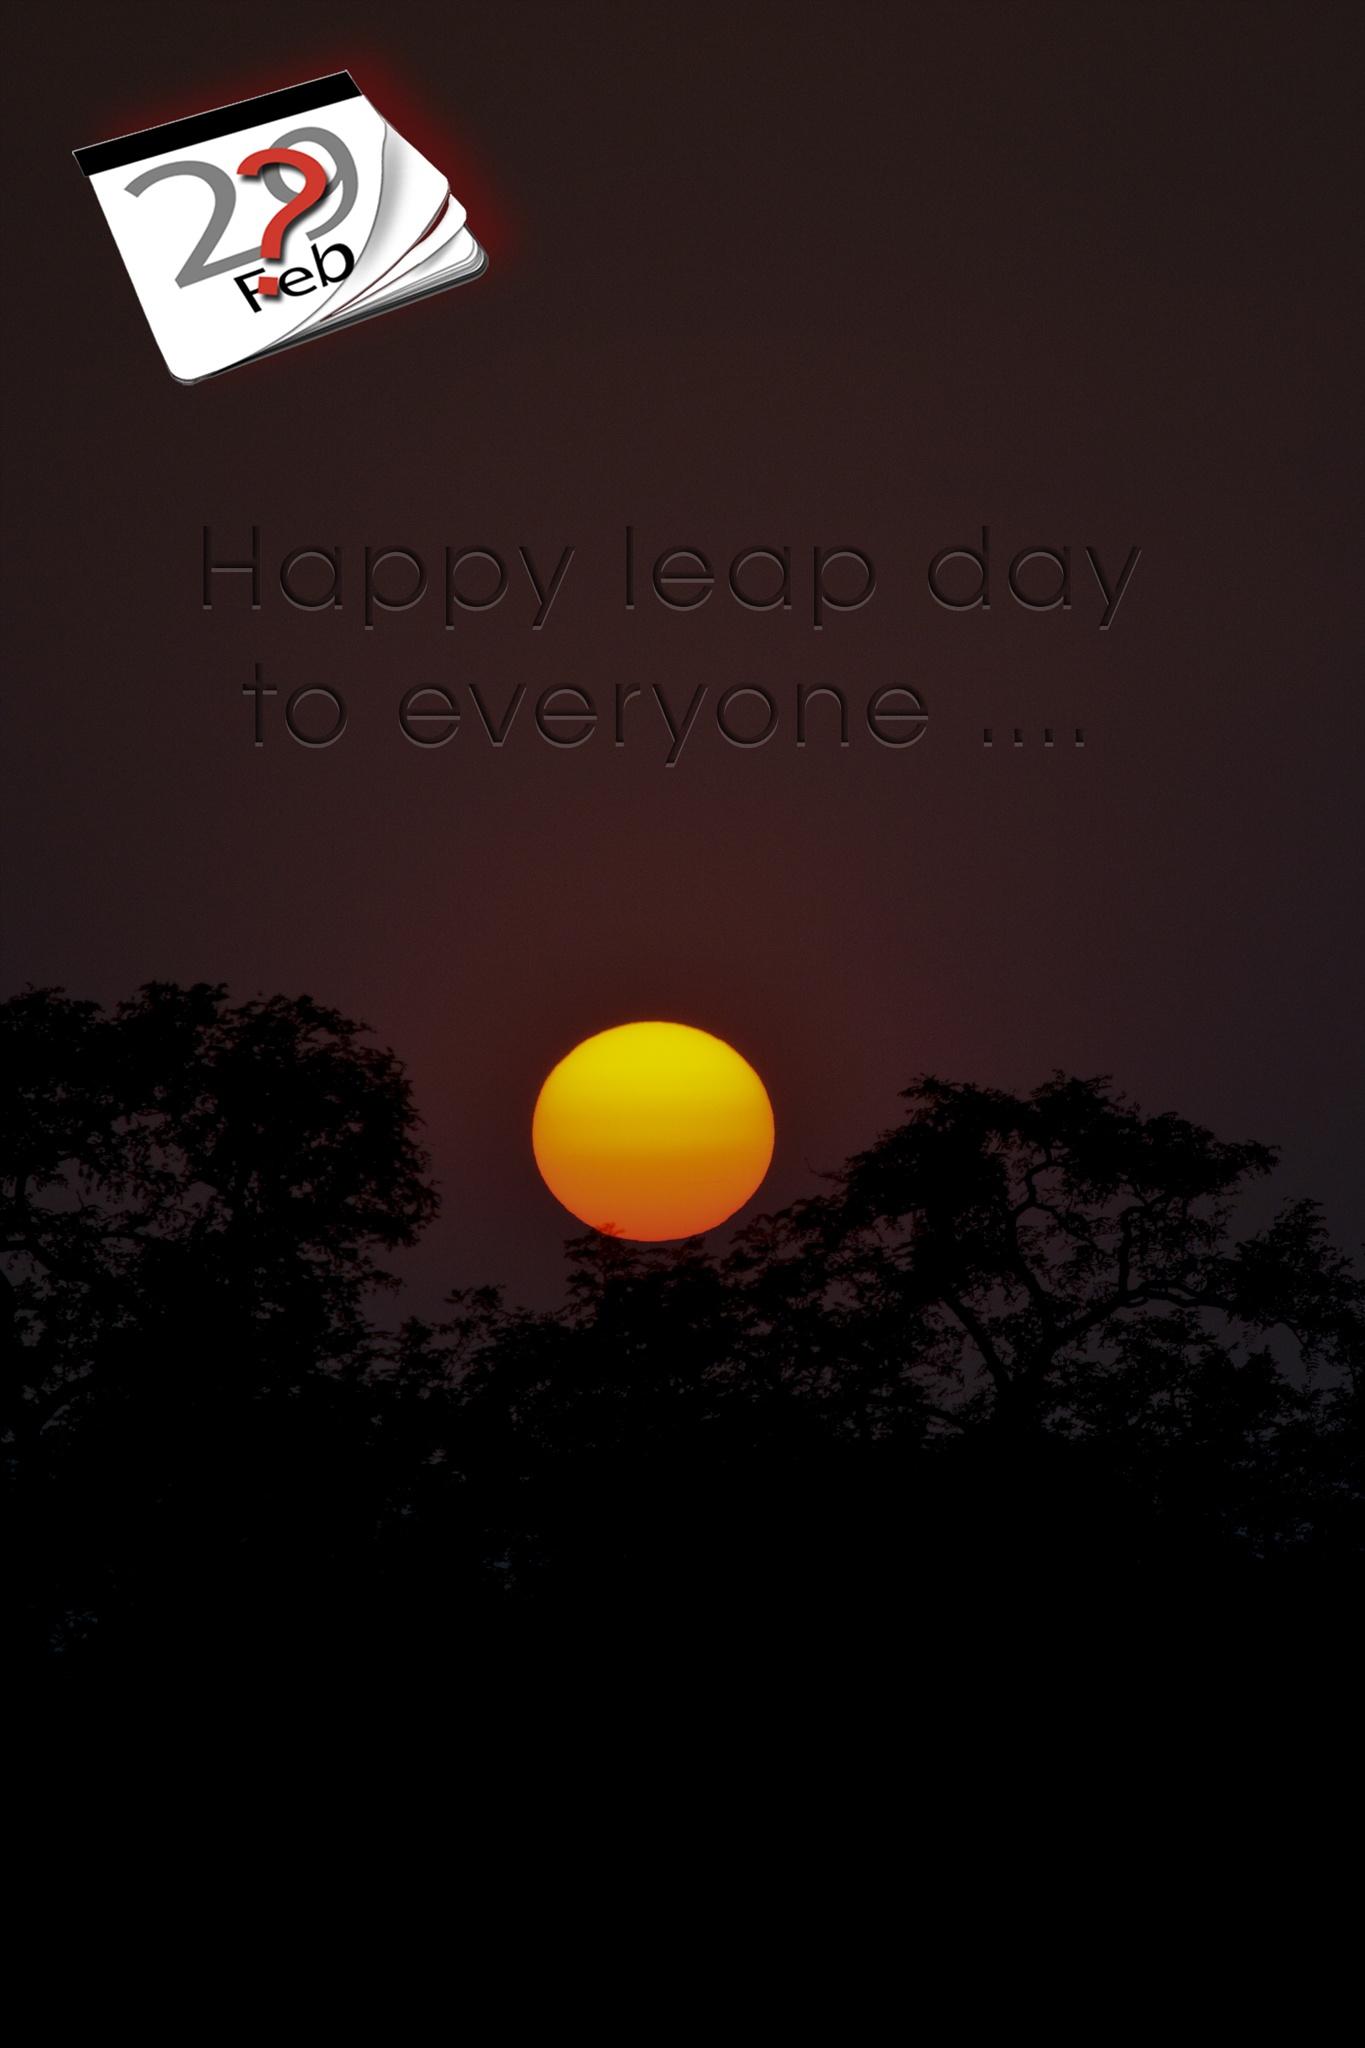 Happy leap day ☺ by Alexander Molnár